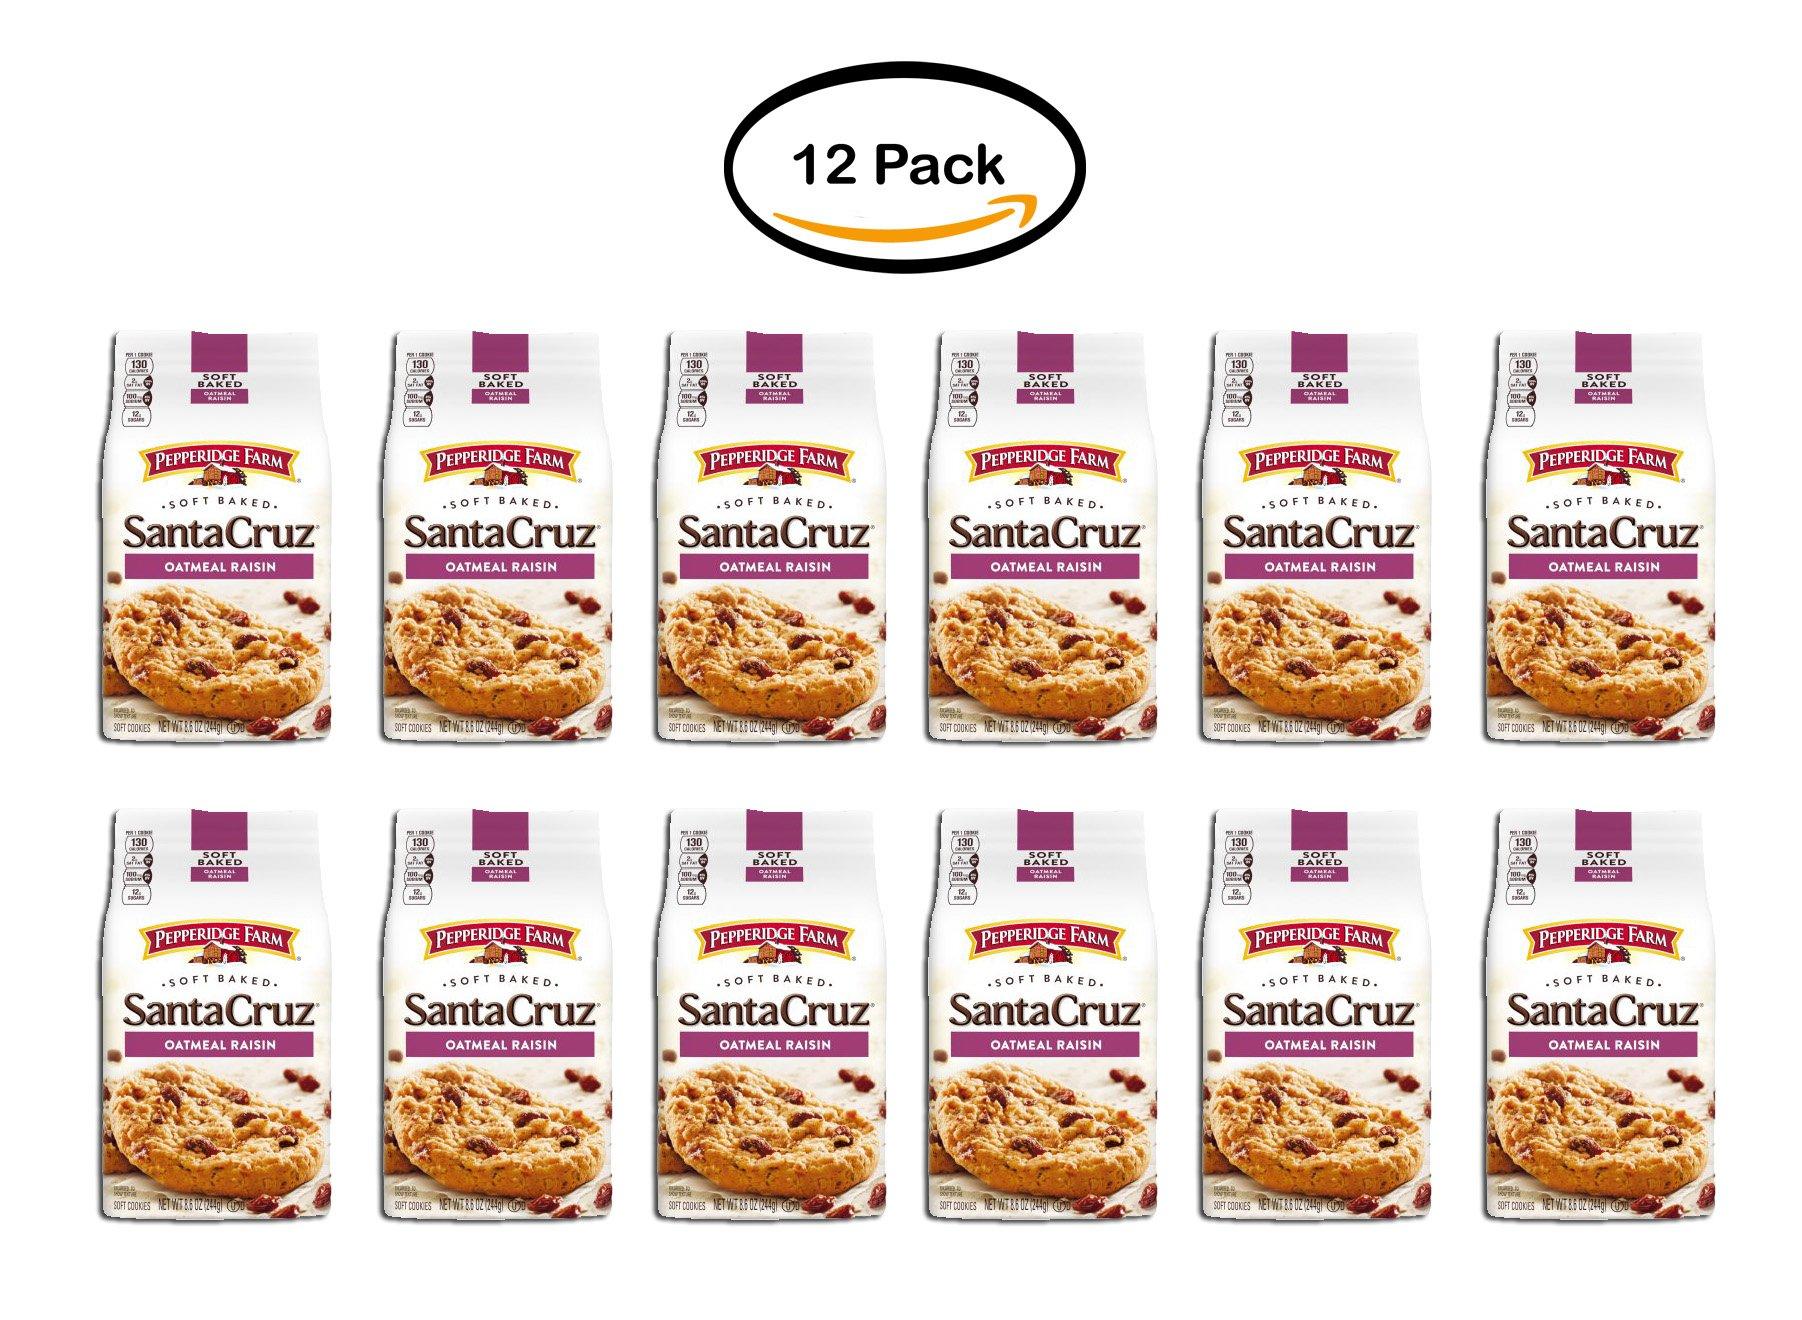 PACK OF 12 - Pepperidge Farm Santa Cruz Soft Baked Oatmeal Raisin Soft Cookies 8.6 oz. Bag by Pepperidge Farm